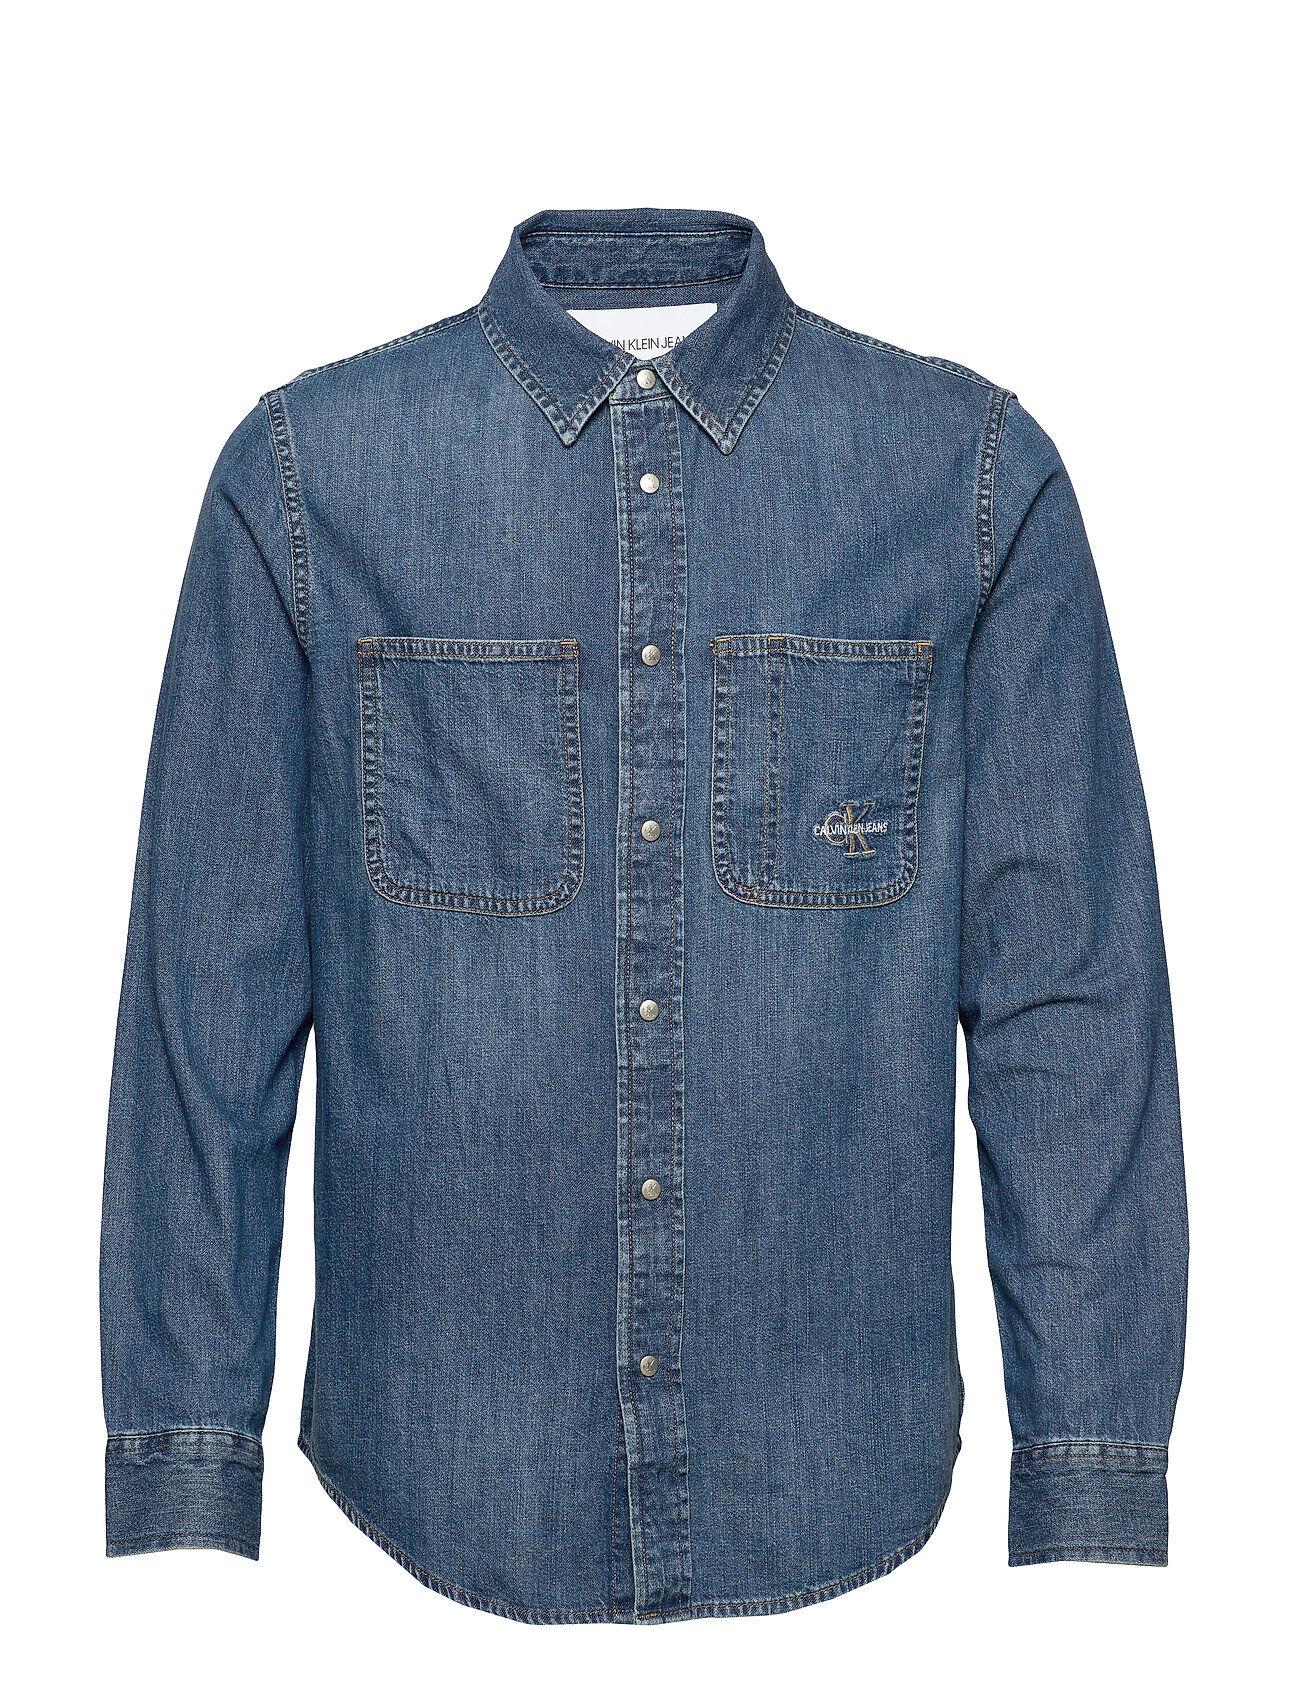 Image of Calvin Iconic Shirt Paita Rento Casual Sininen Calvin Klein Jeans